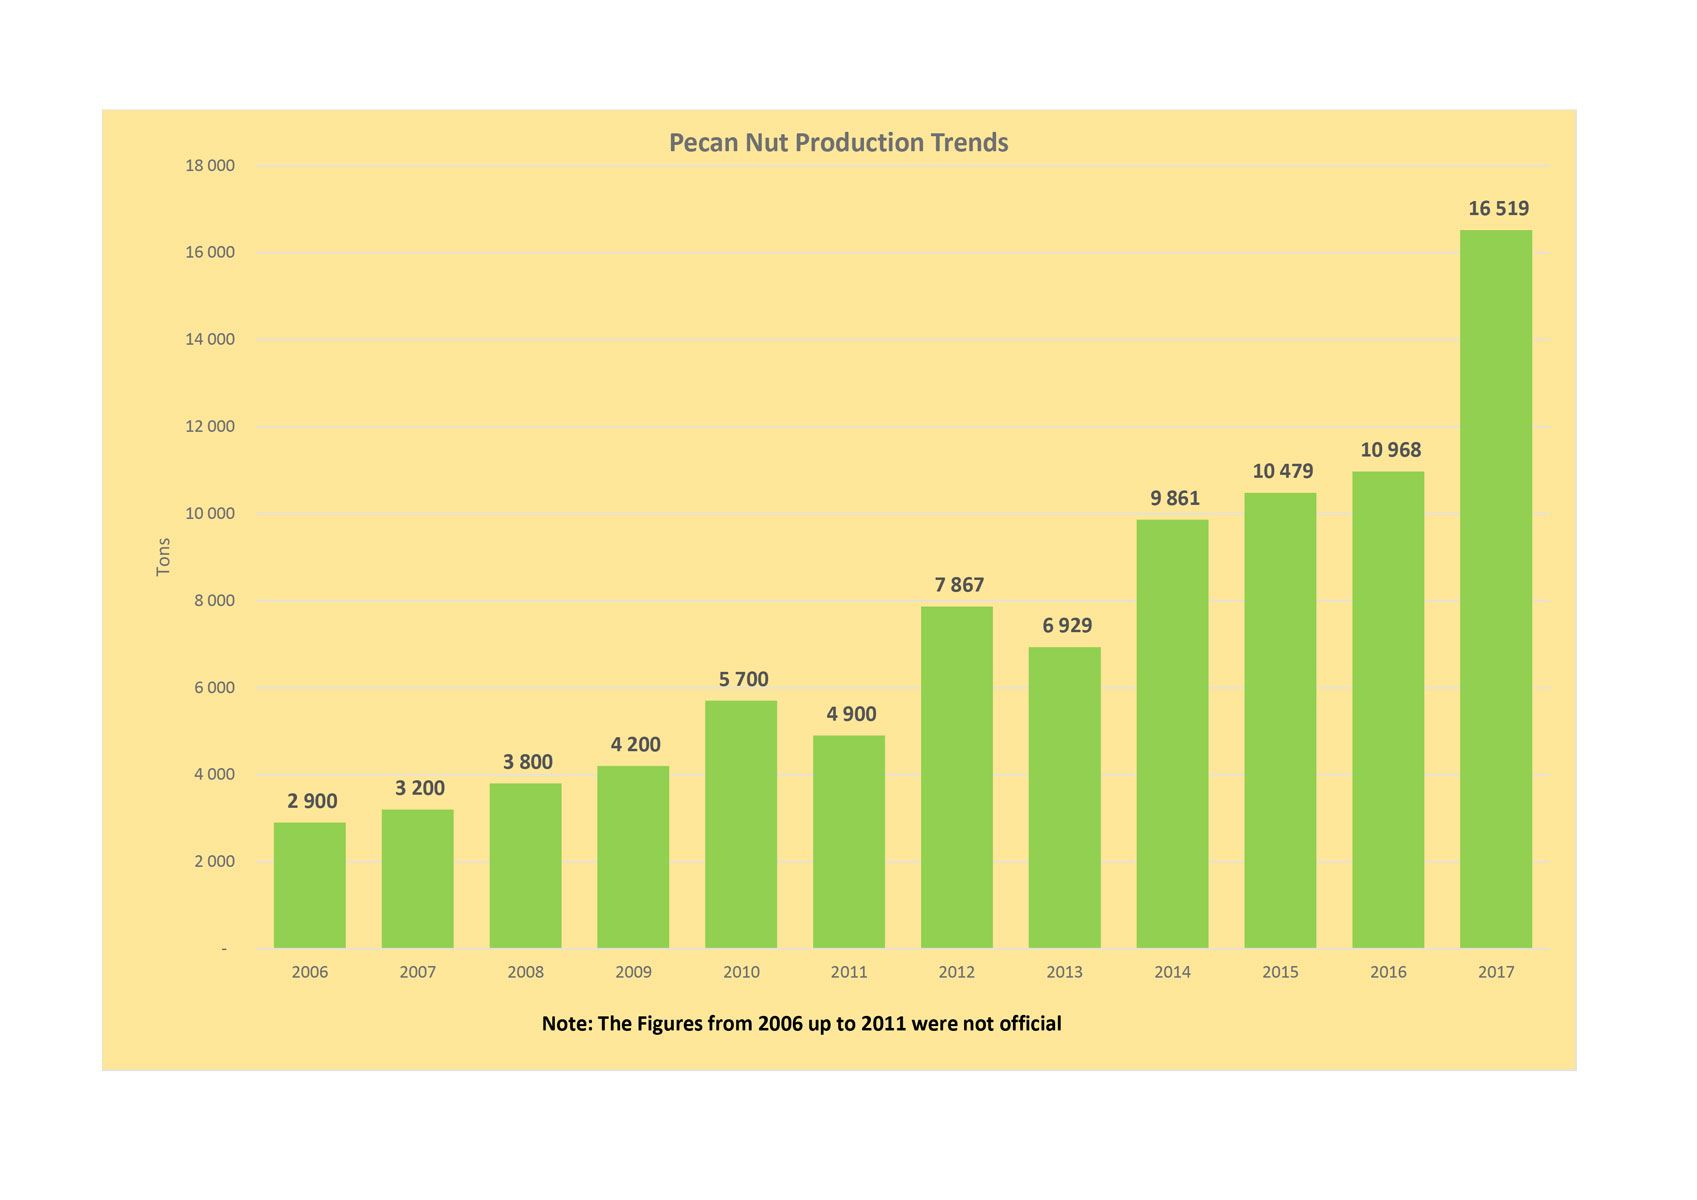 Pecan Nut Production 2017